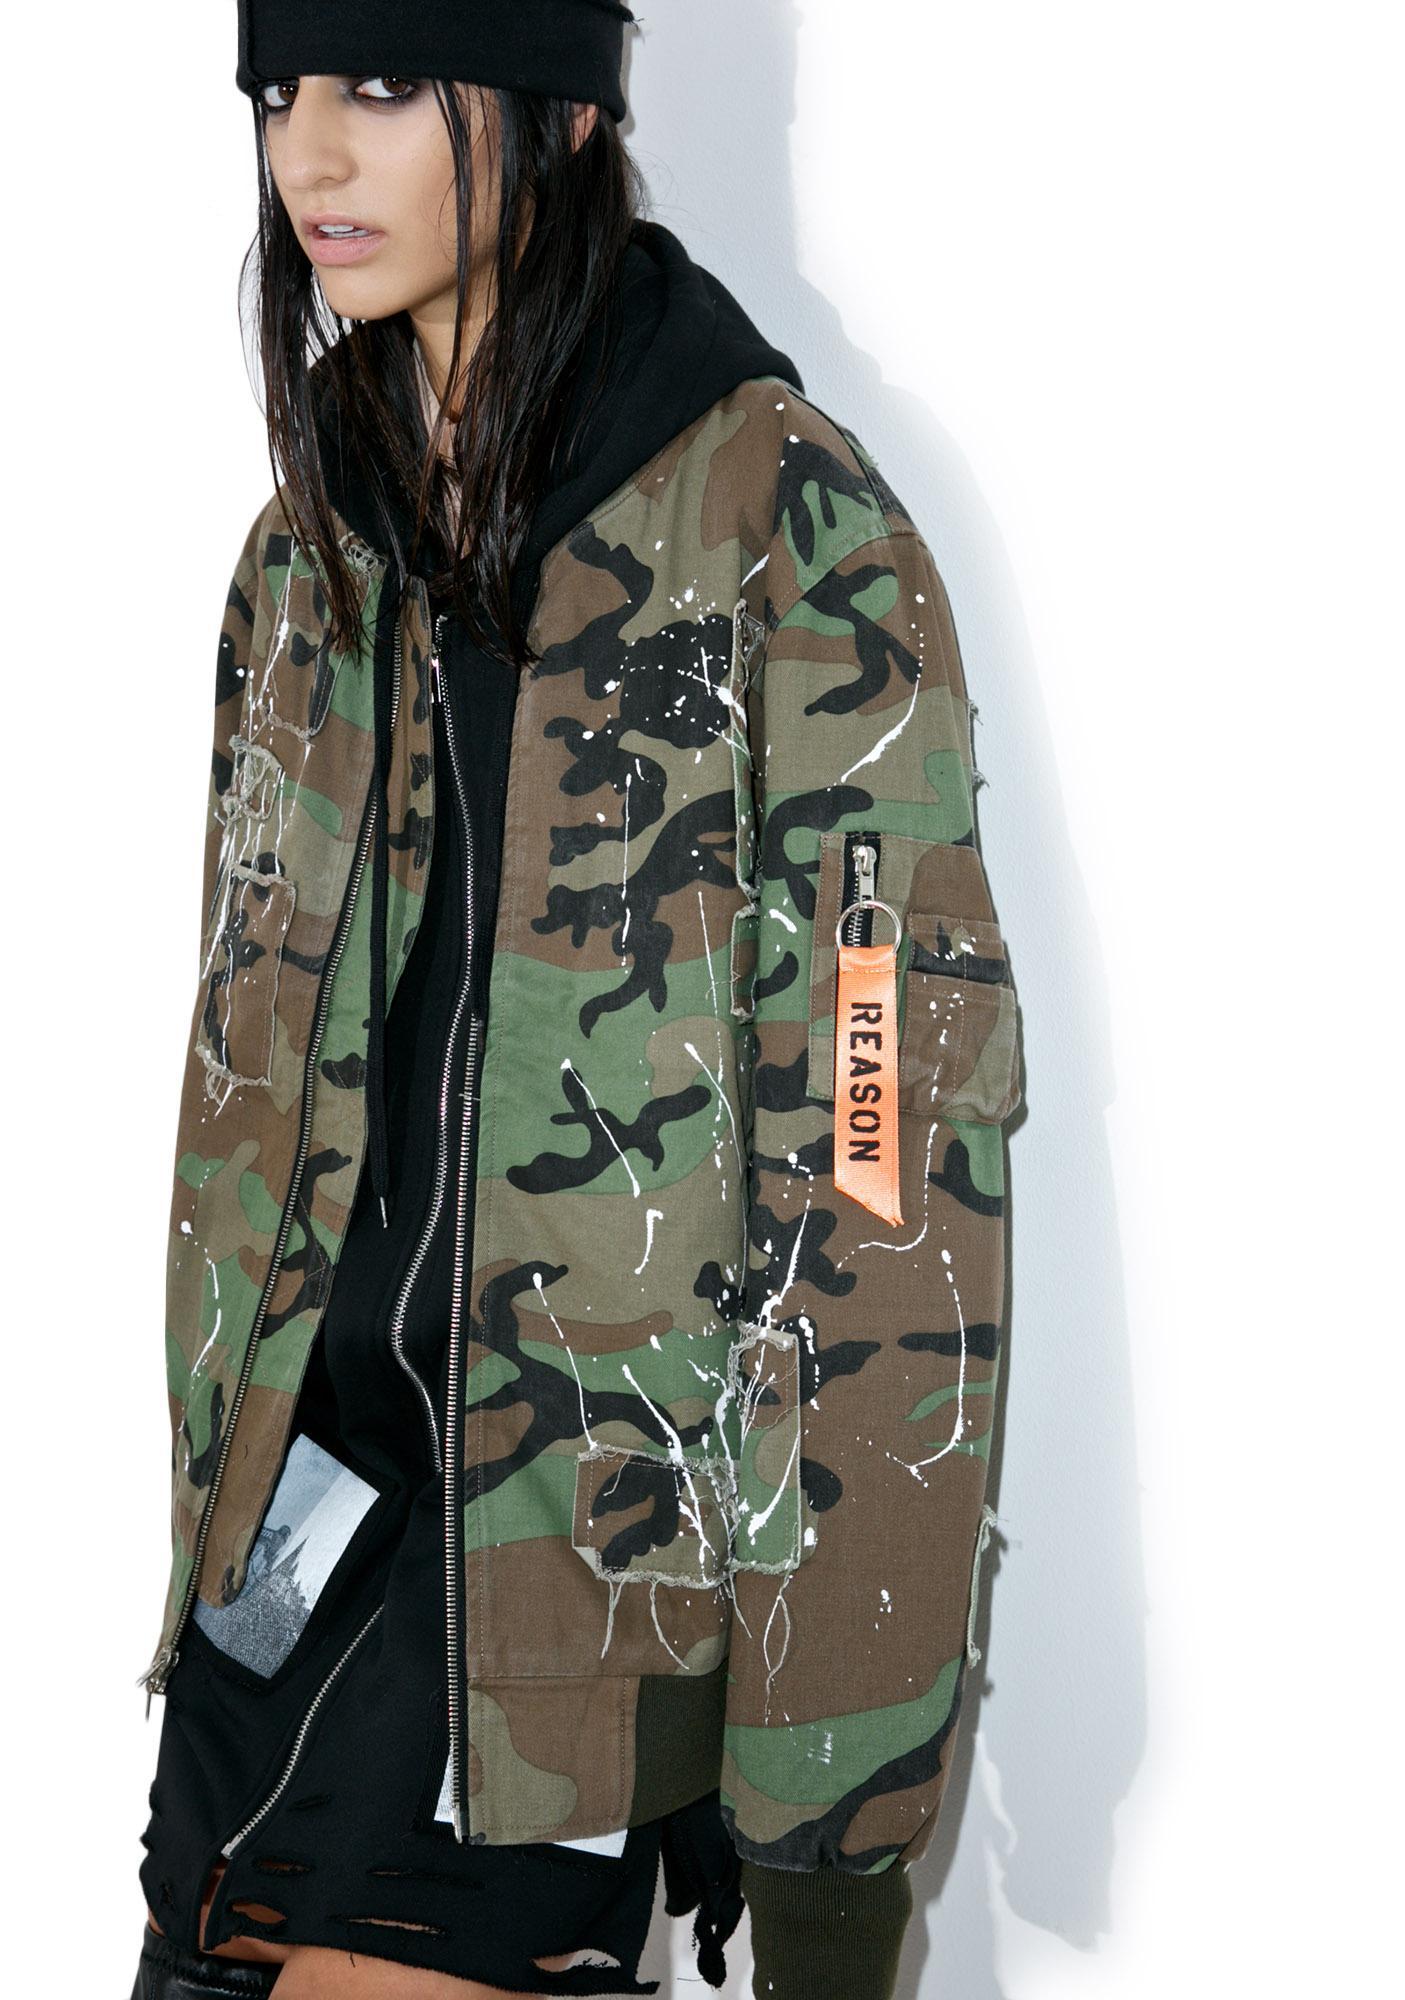 Reason Militia Splatter Bomber Jacket